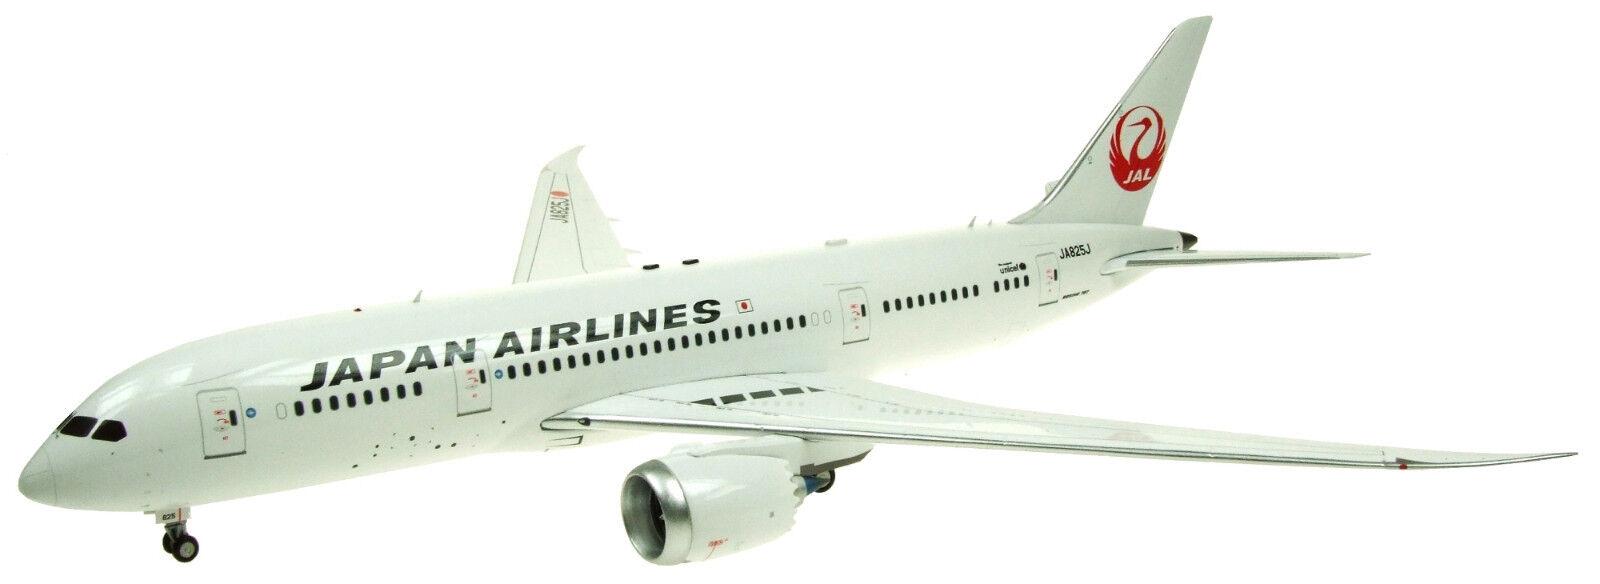 Inflight 200 Wb787825j 1 200 Jal 787-8 Dreamliner Ja825j avec Pied